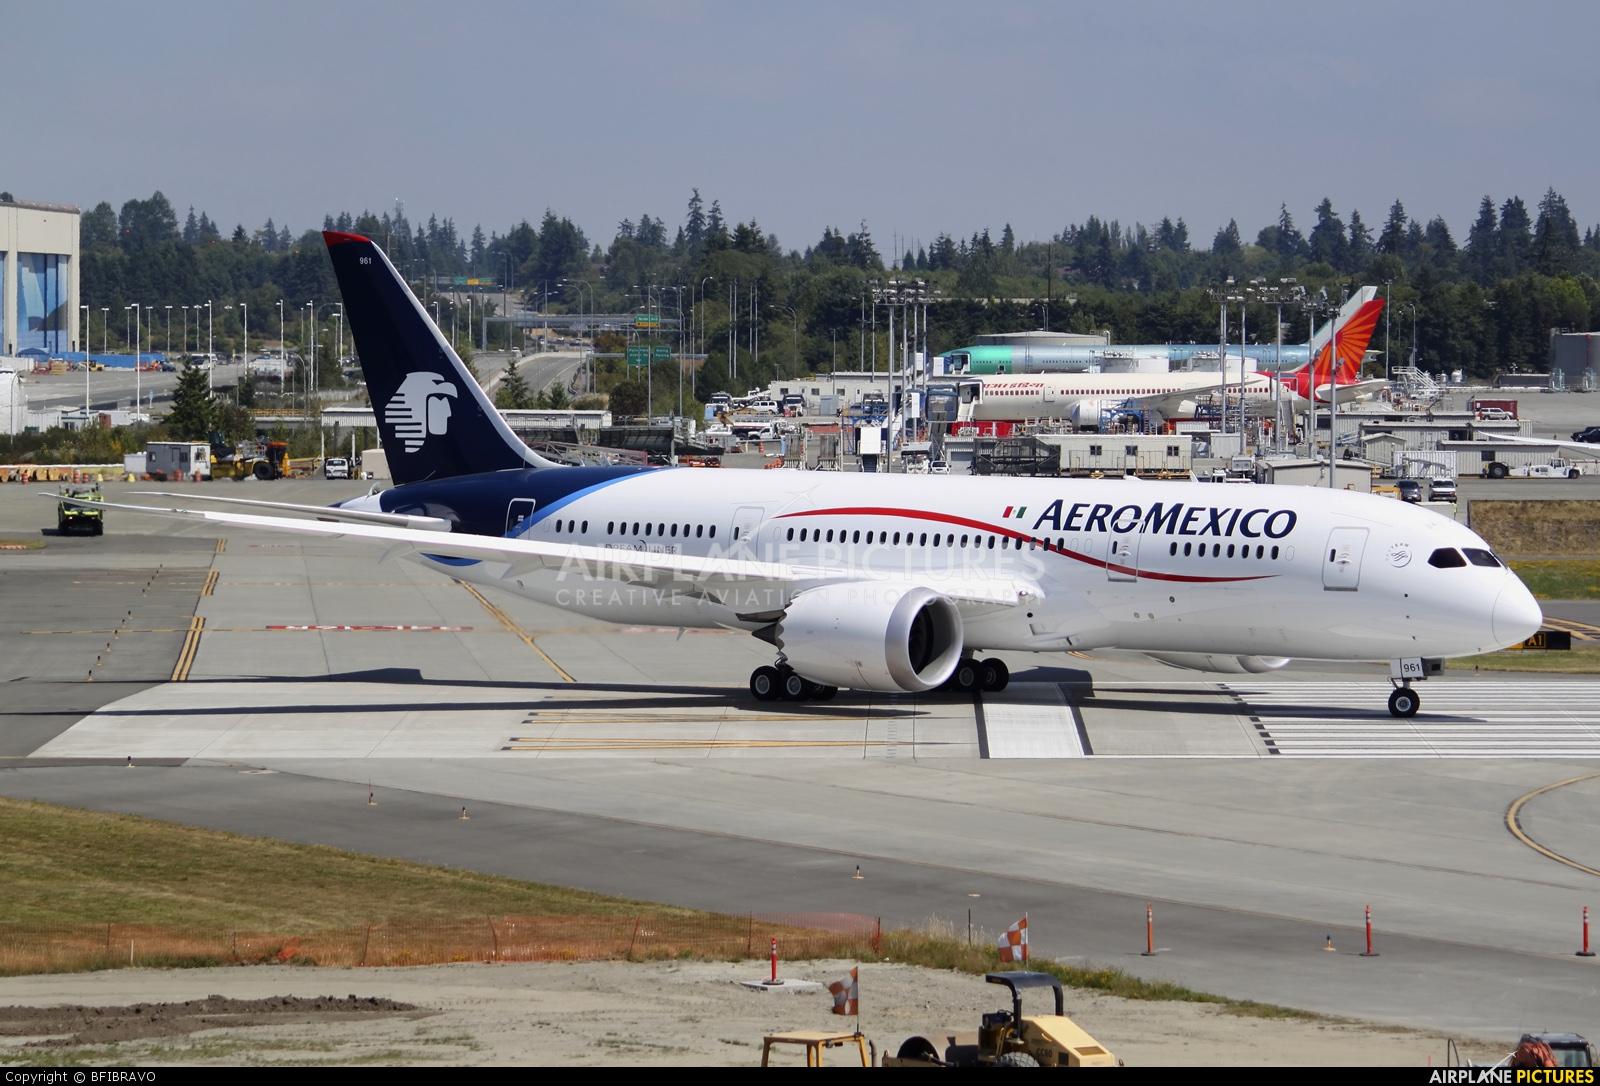 aeromexico dreamliner arrives